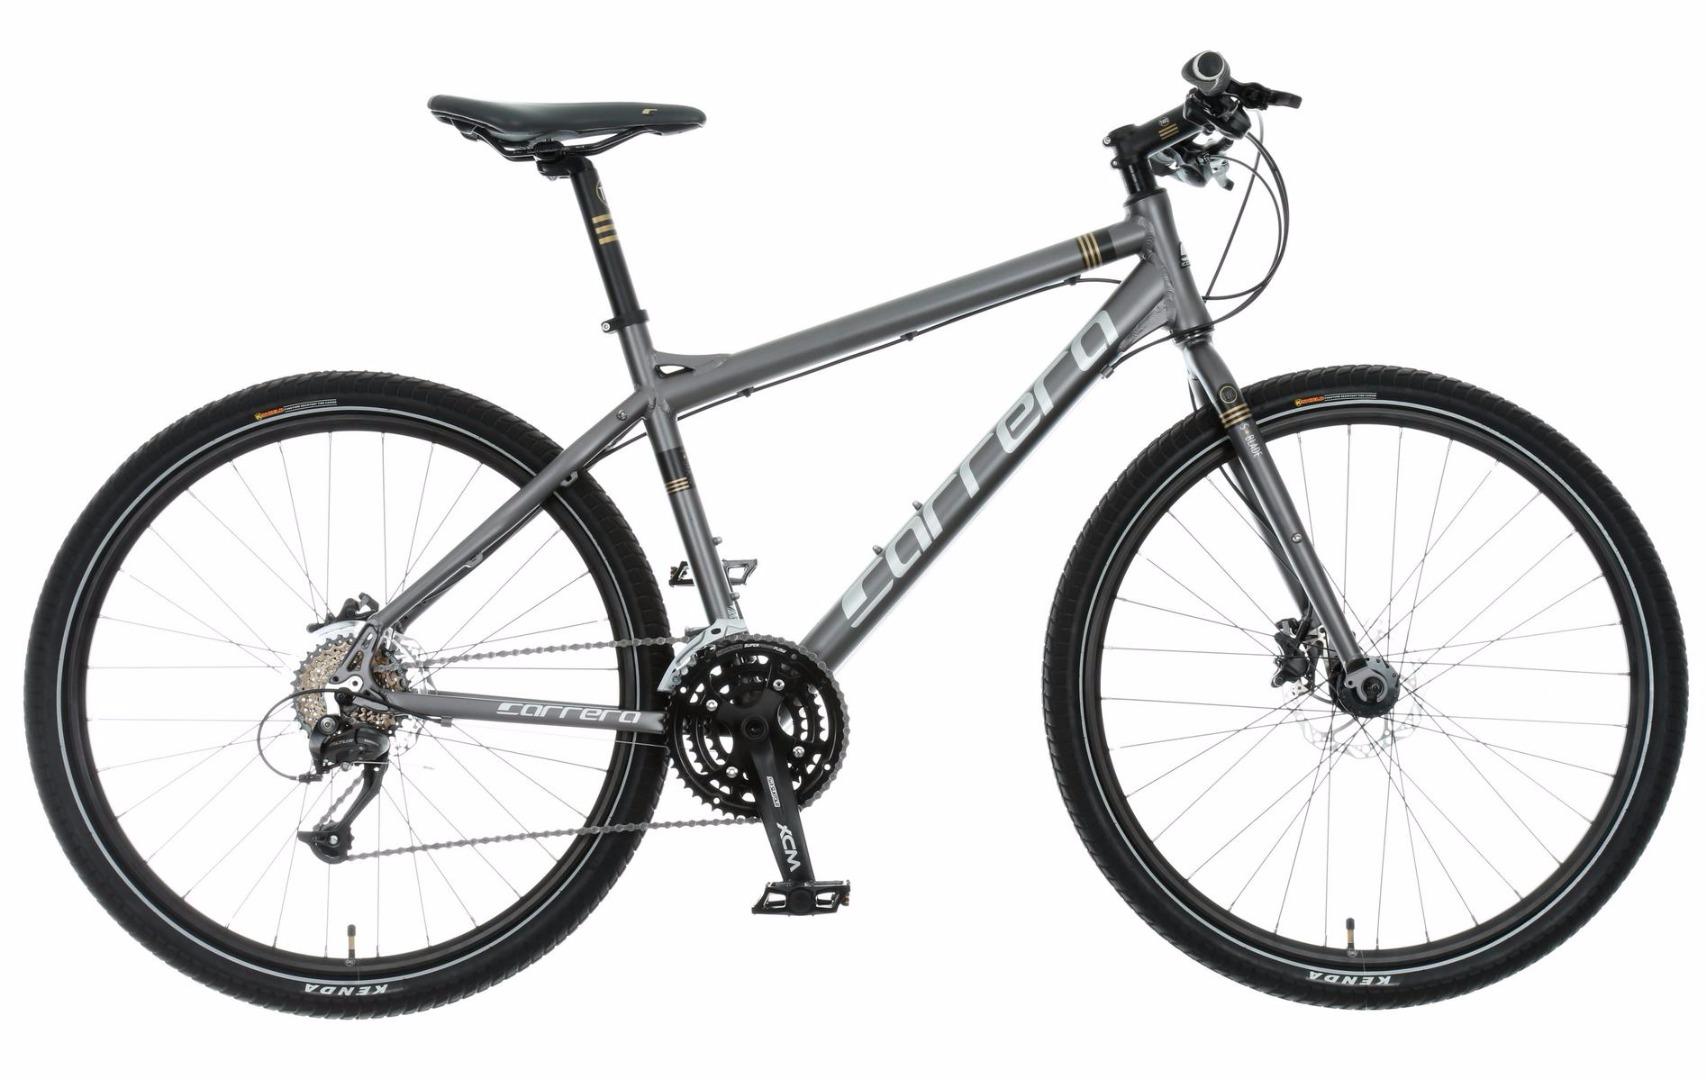 Stolen Carrera Bicycles Hybrid Bike